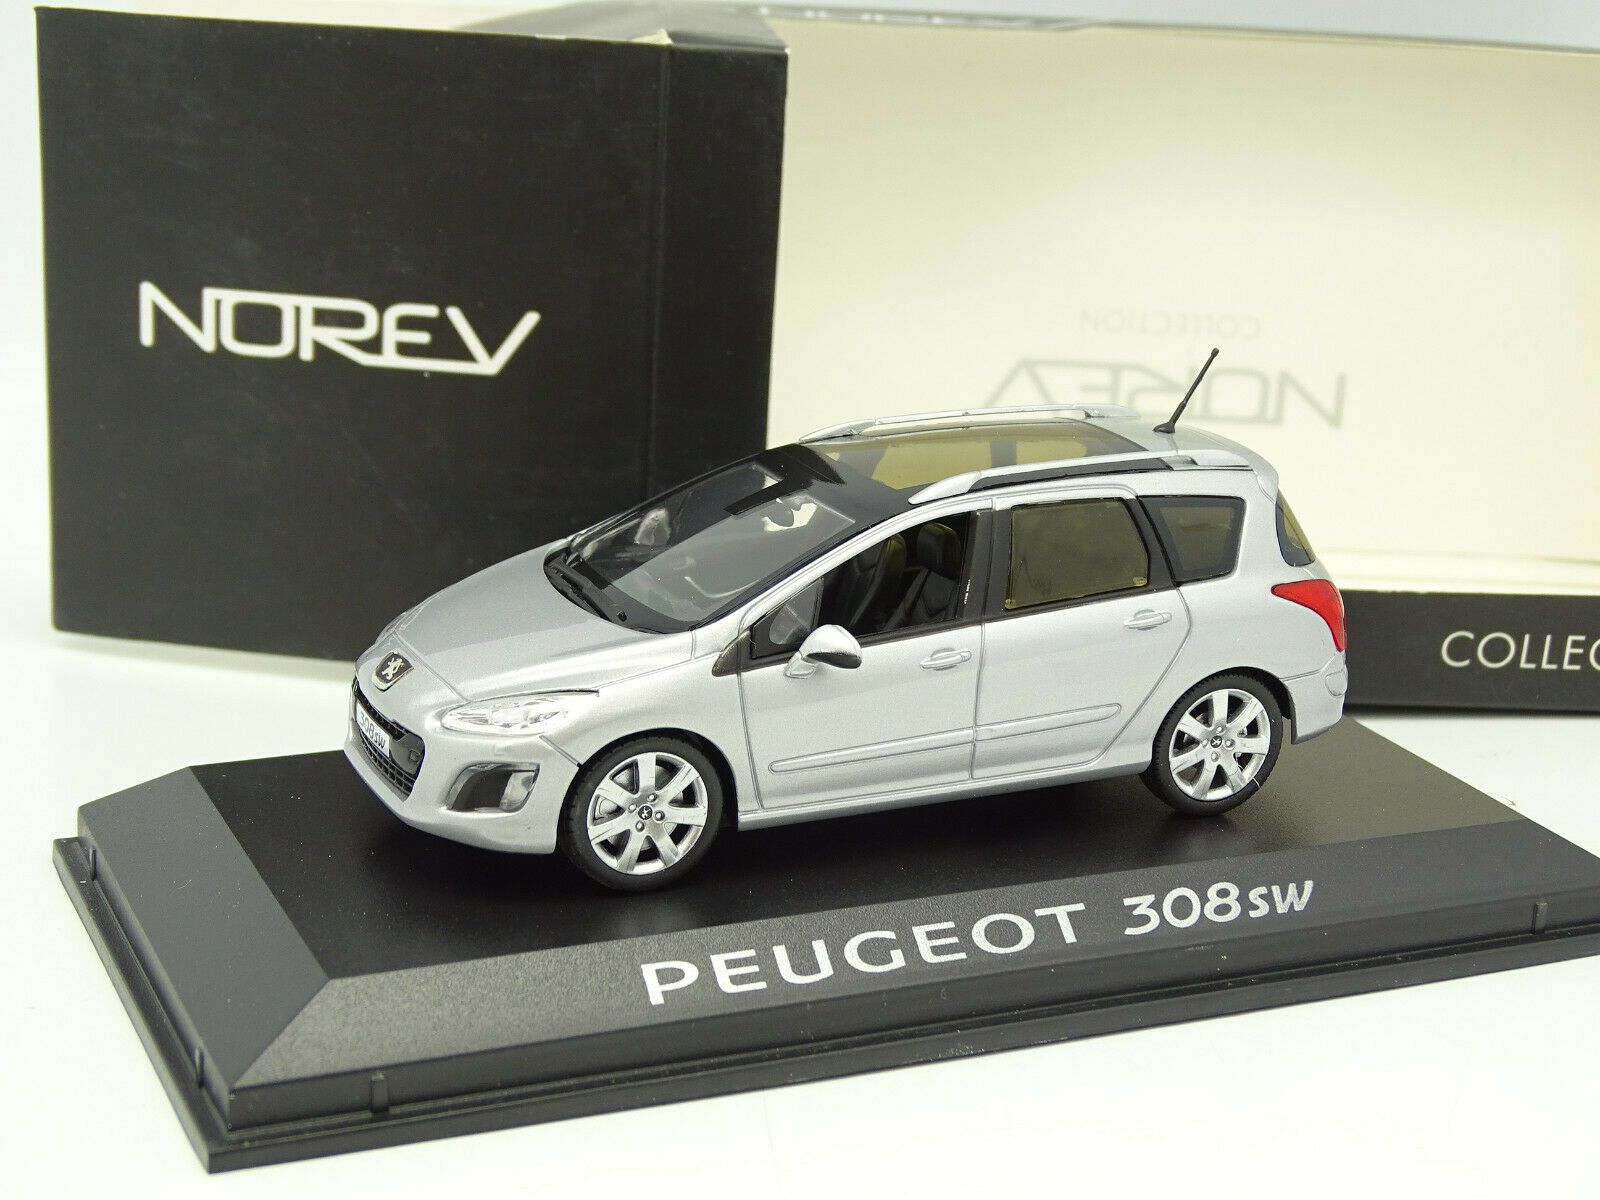 Norev 1 43 - Peugeot 308 Sw argento